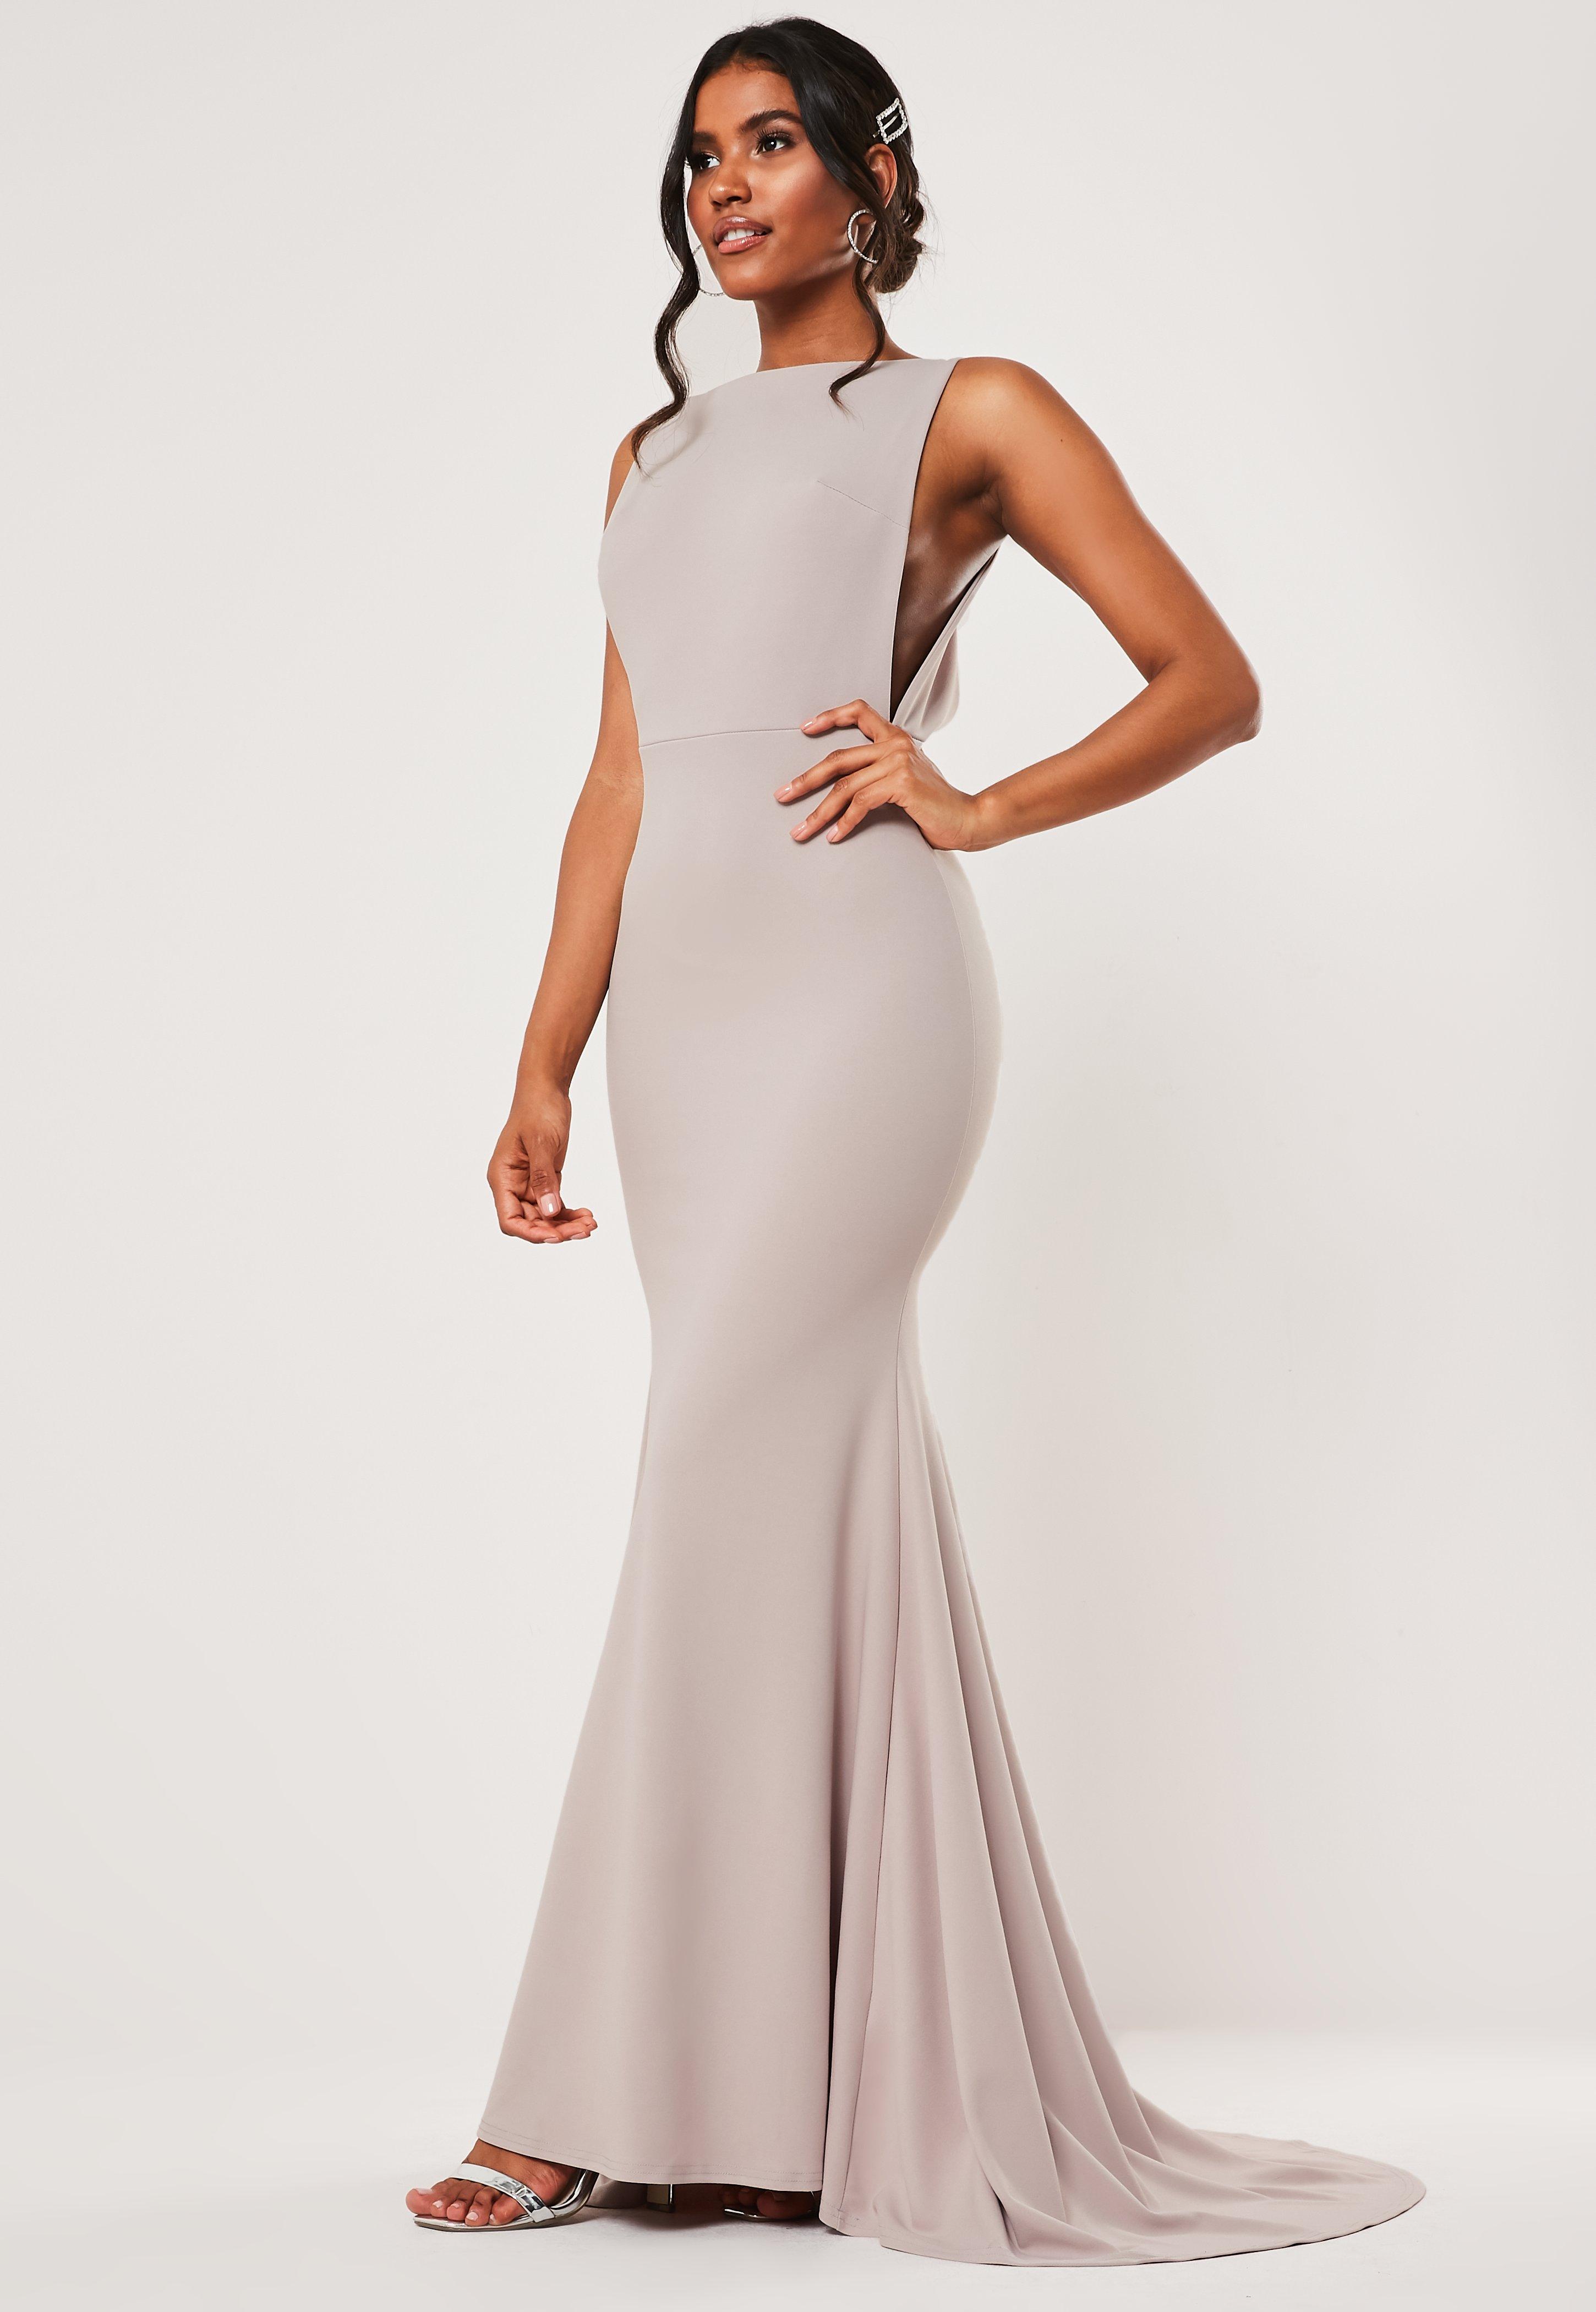 7ddefa89e43 Bridesmaid Grey Sleeveless Low Back Maxi Dress